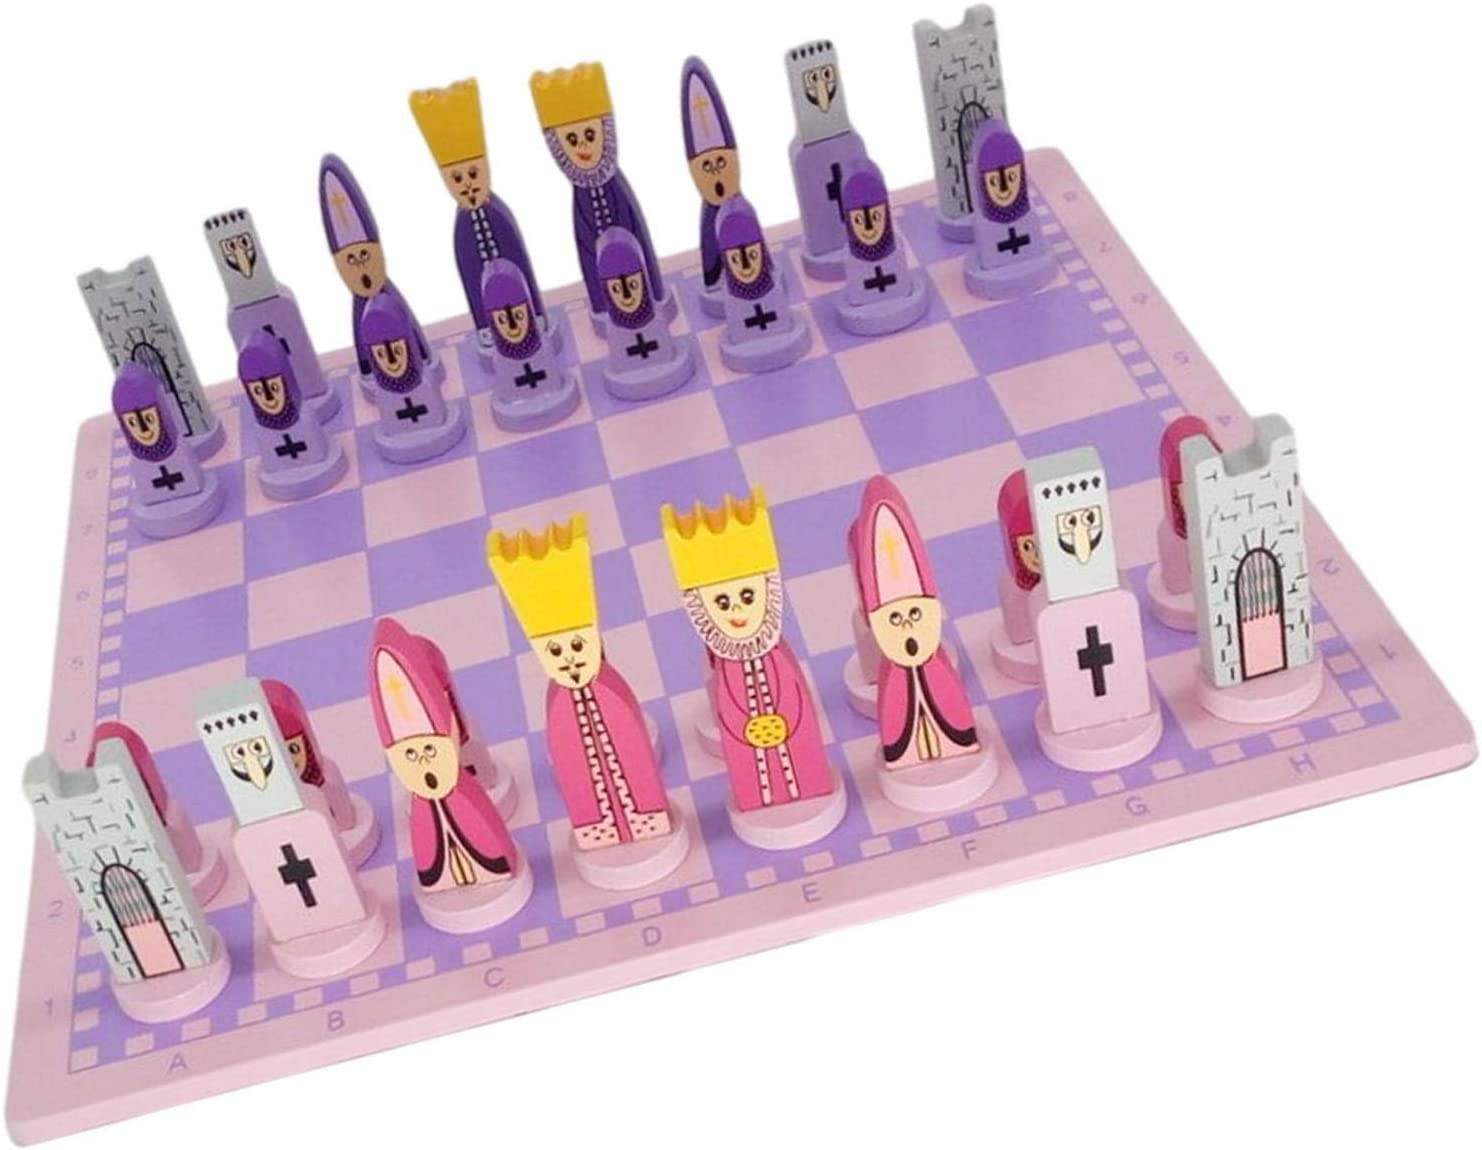 Rivetino Chess Wooden free shipping Travel Foldable Chessbo shipfree Portable Set